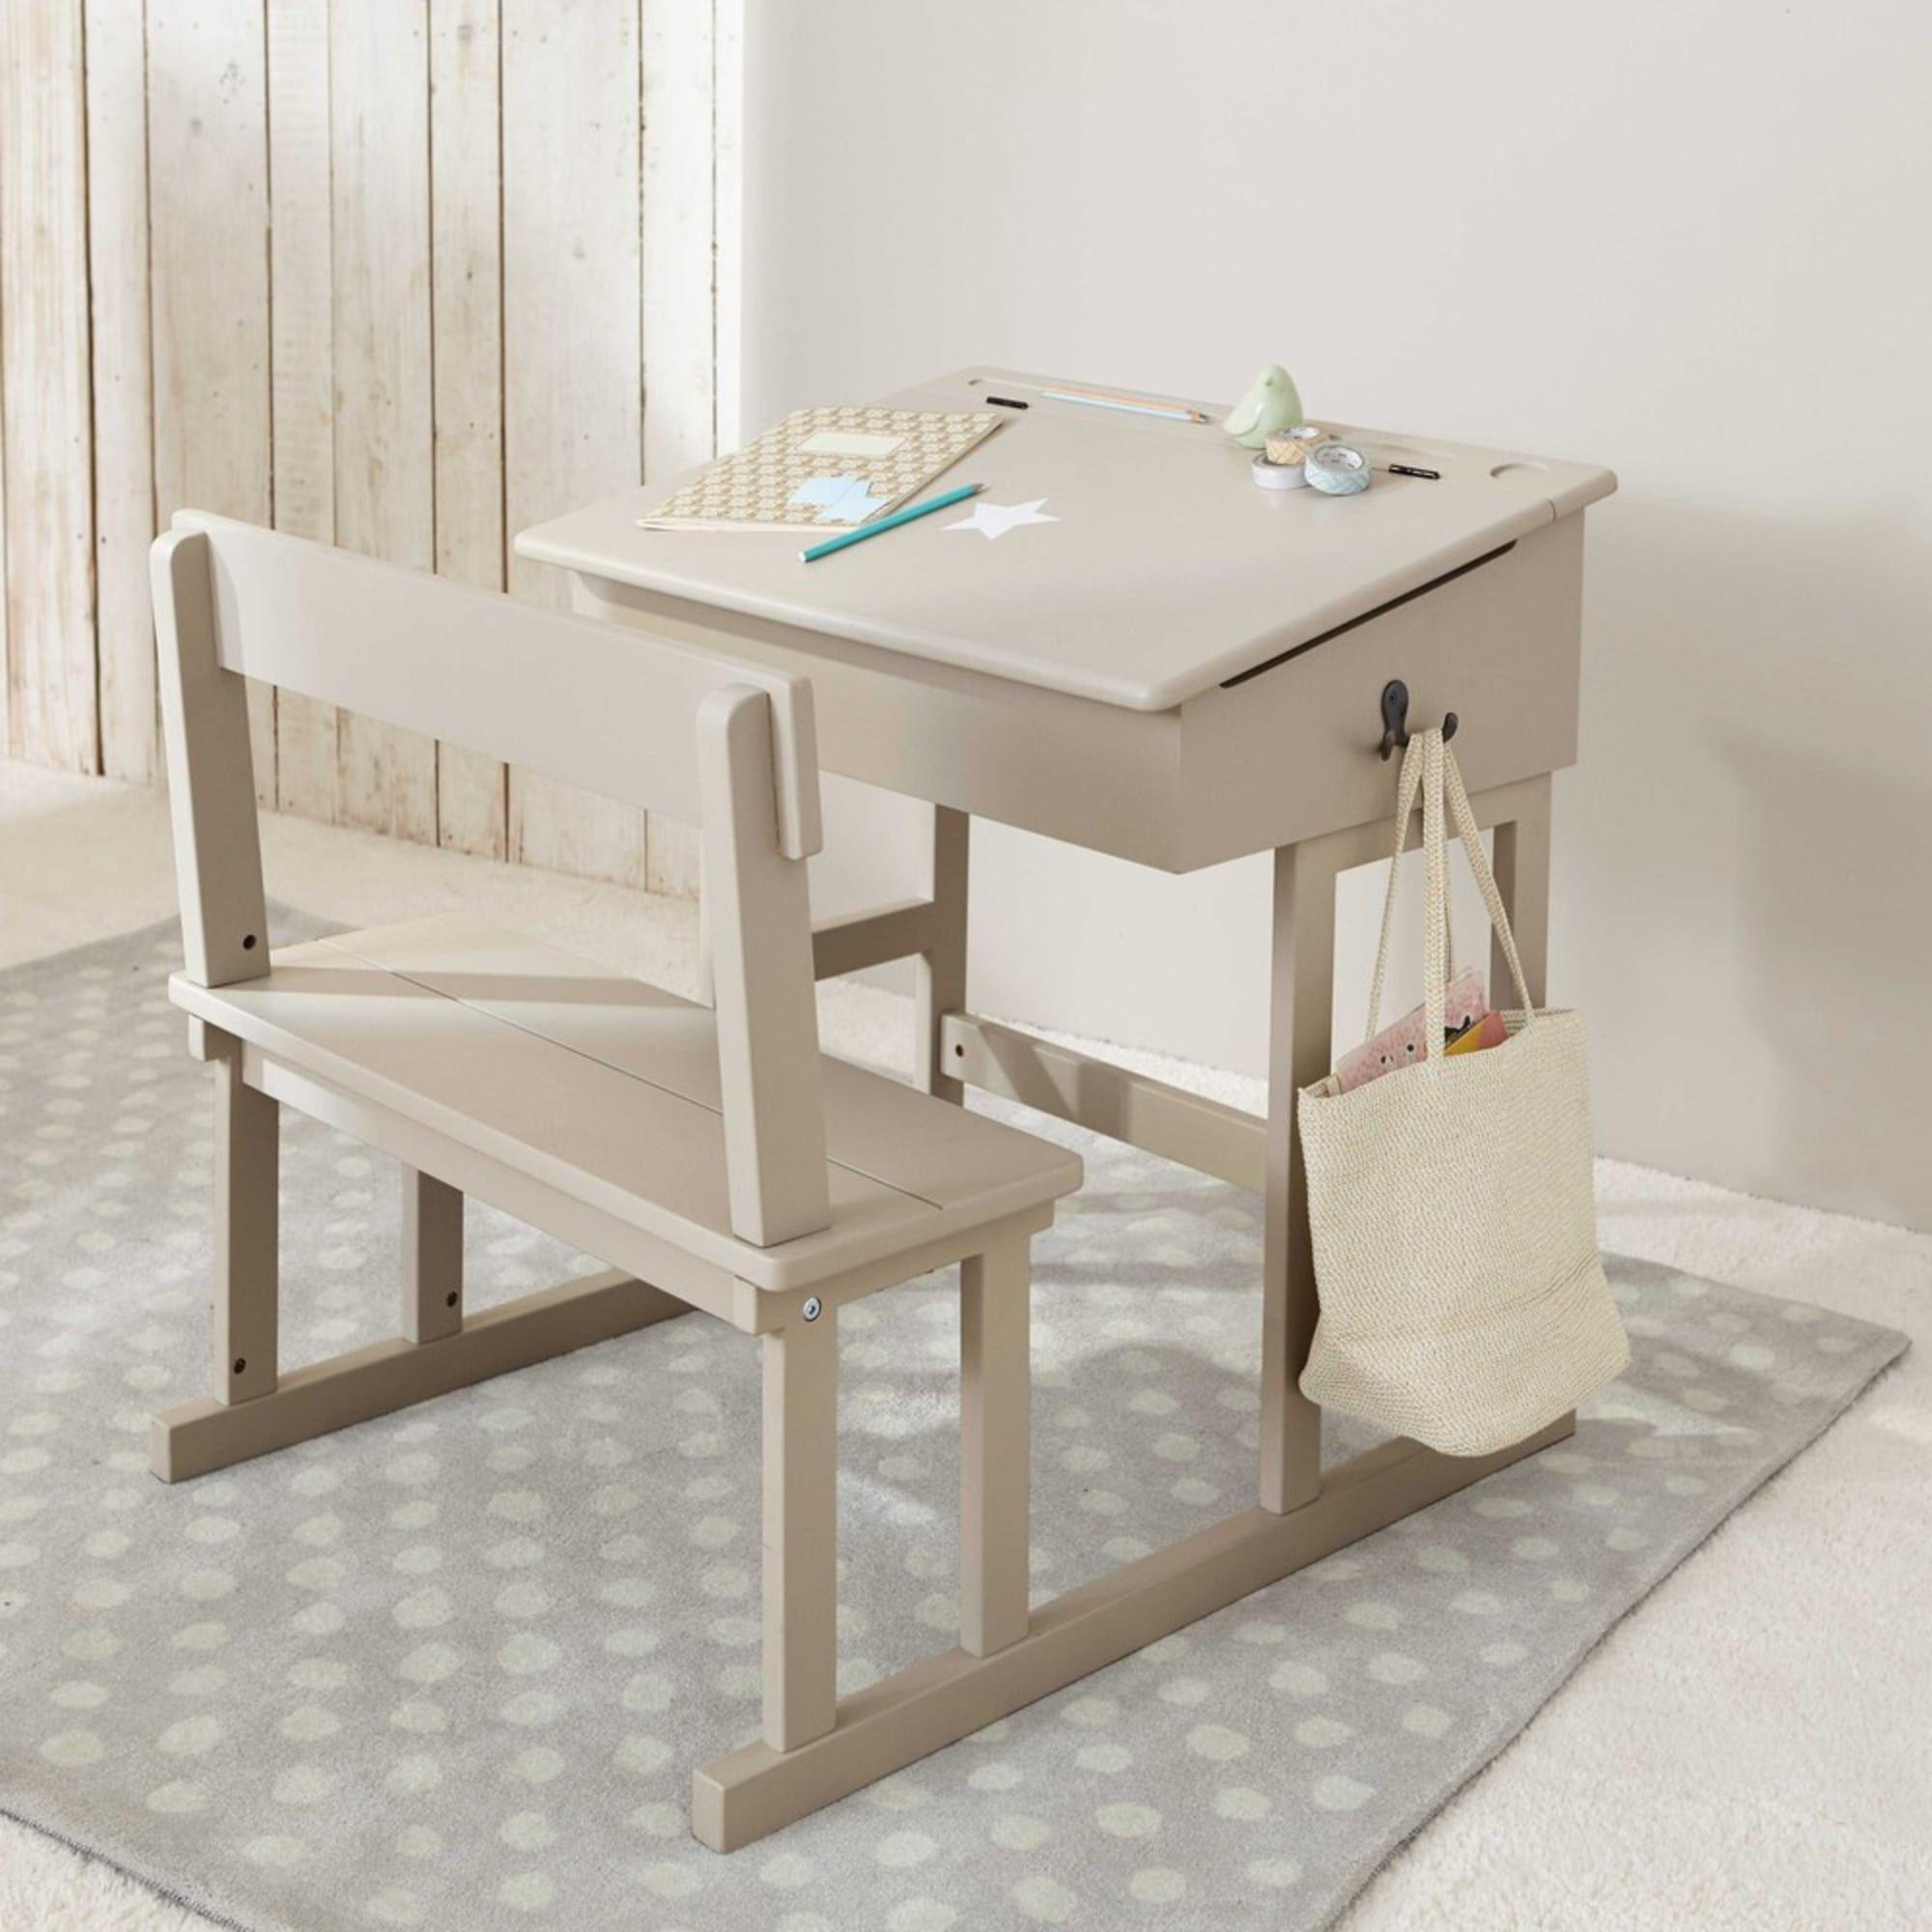 Taupe Children S Desk With White Star Print Pupitre Maisons Du Monde In 2020 Childrens Desk Kid Desk Restaurant Chairs For Sale